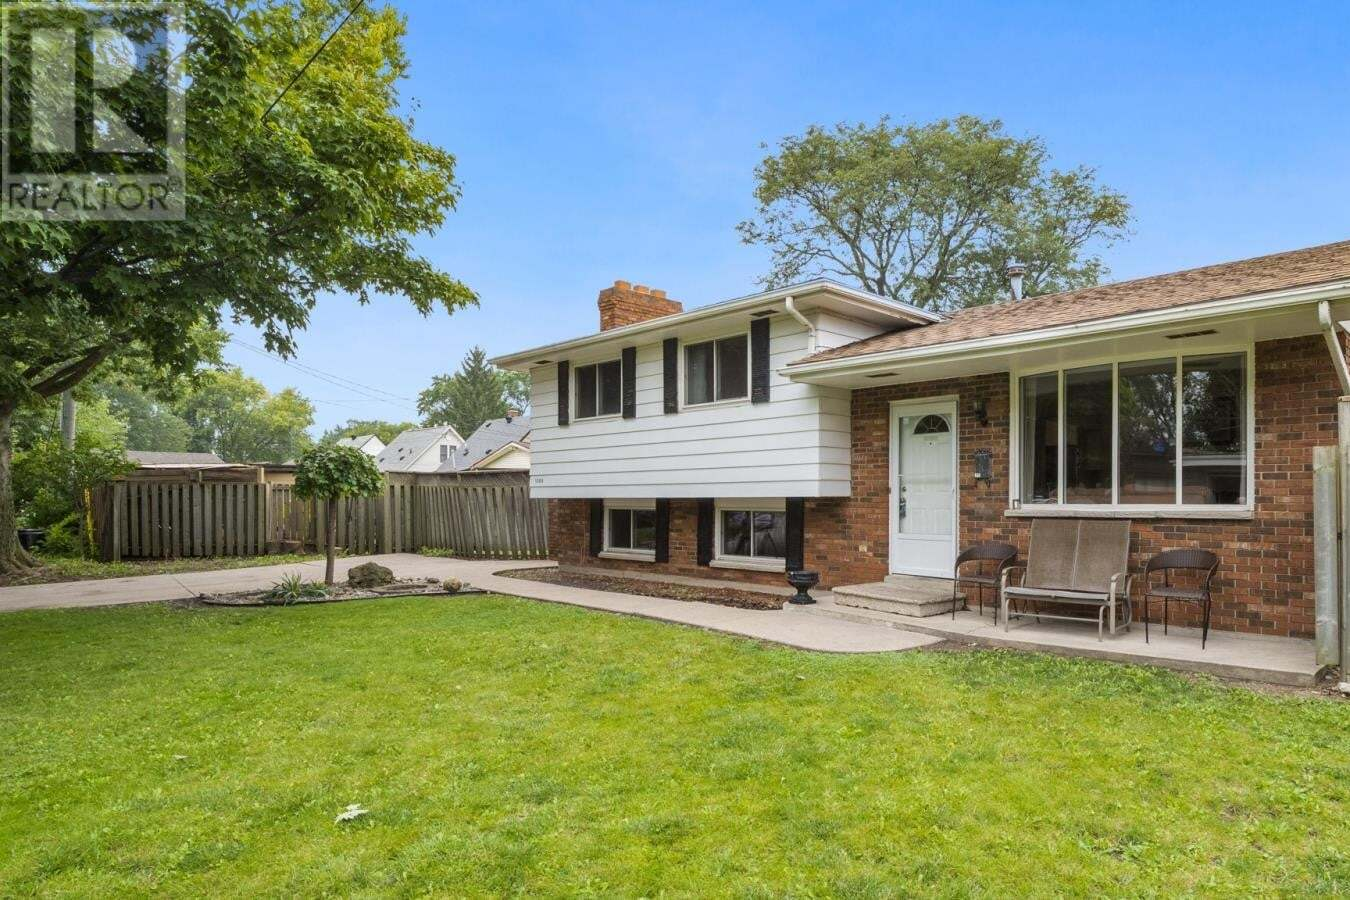 House for sale at 1300 Marlborough  Windsor Ontario - MLS: 20011975